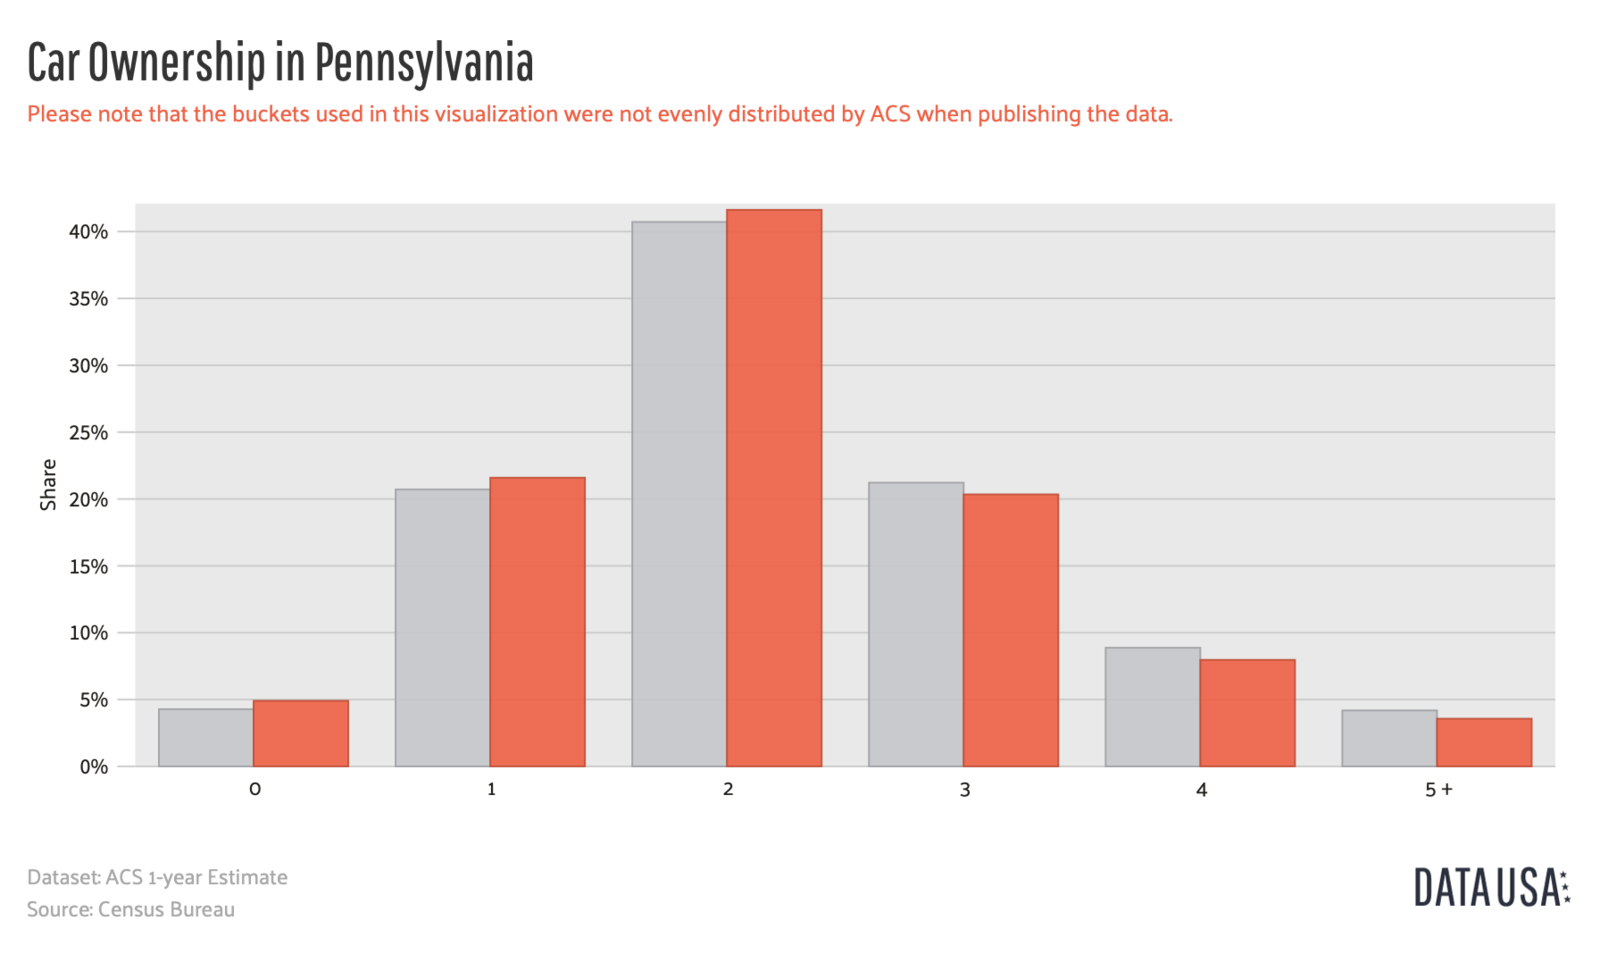 Data USA - Bar Chart of Car Ownership in Pennsylvania-medium